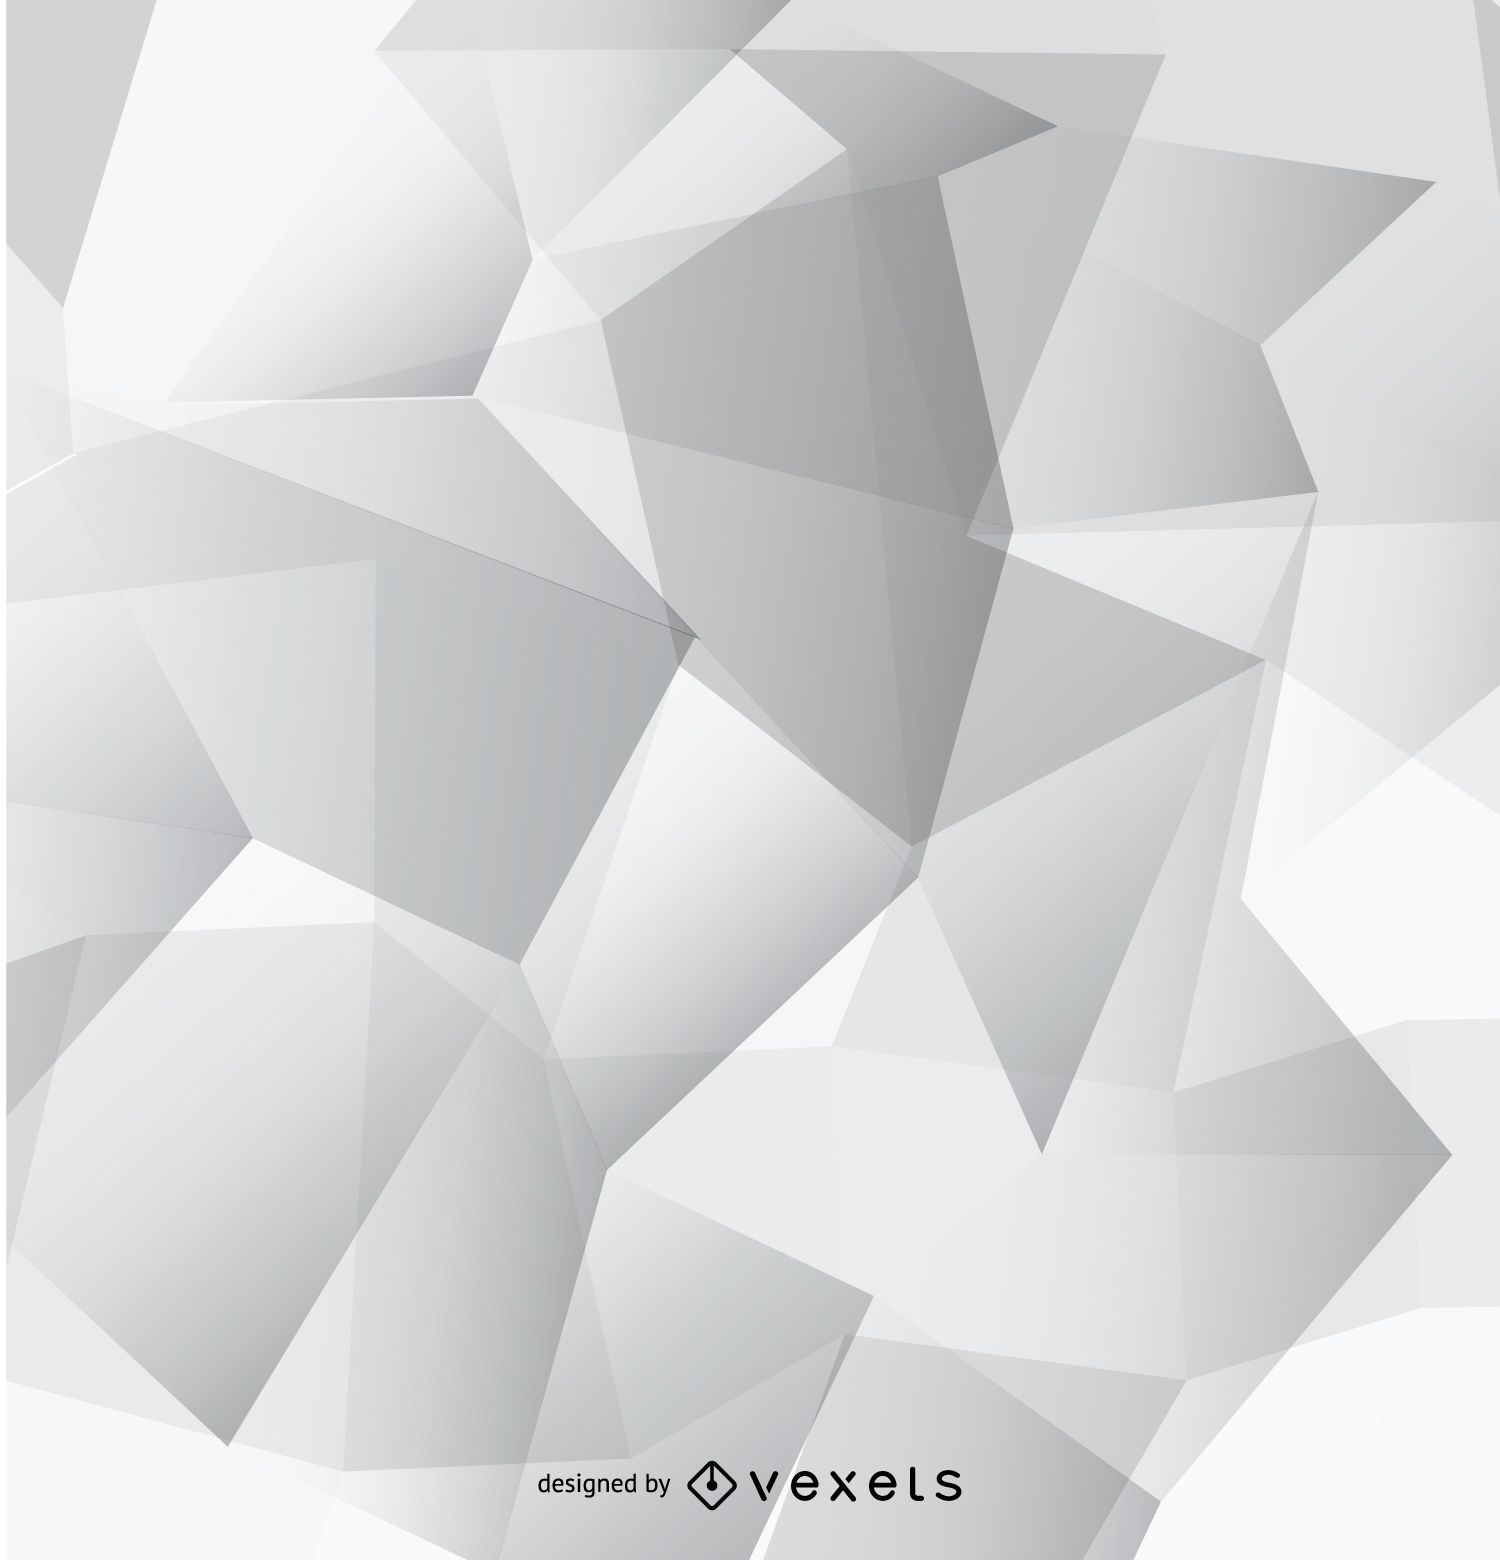 Abstract Grey Polygonal Wallpaper